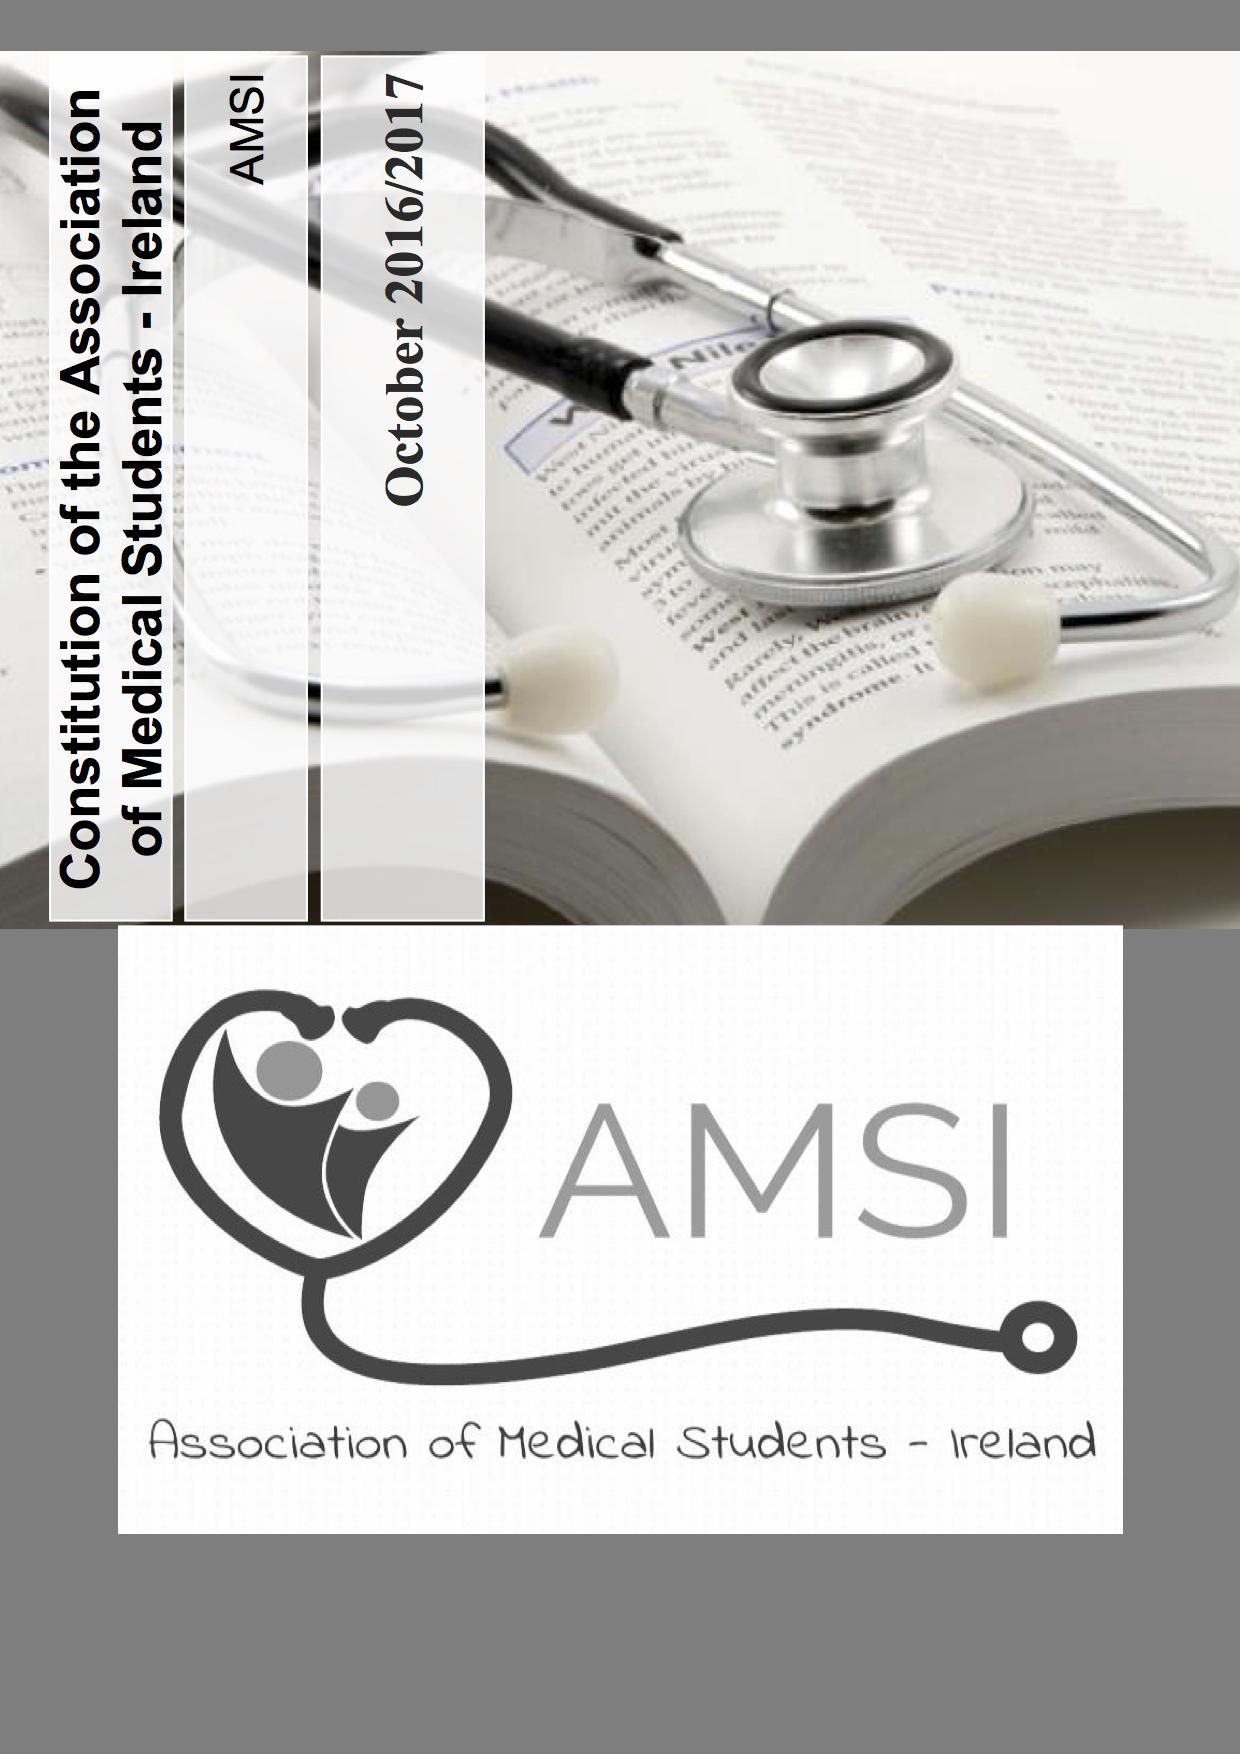 AMSI-FInal-Constitution.jpg